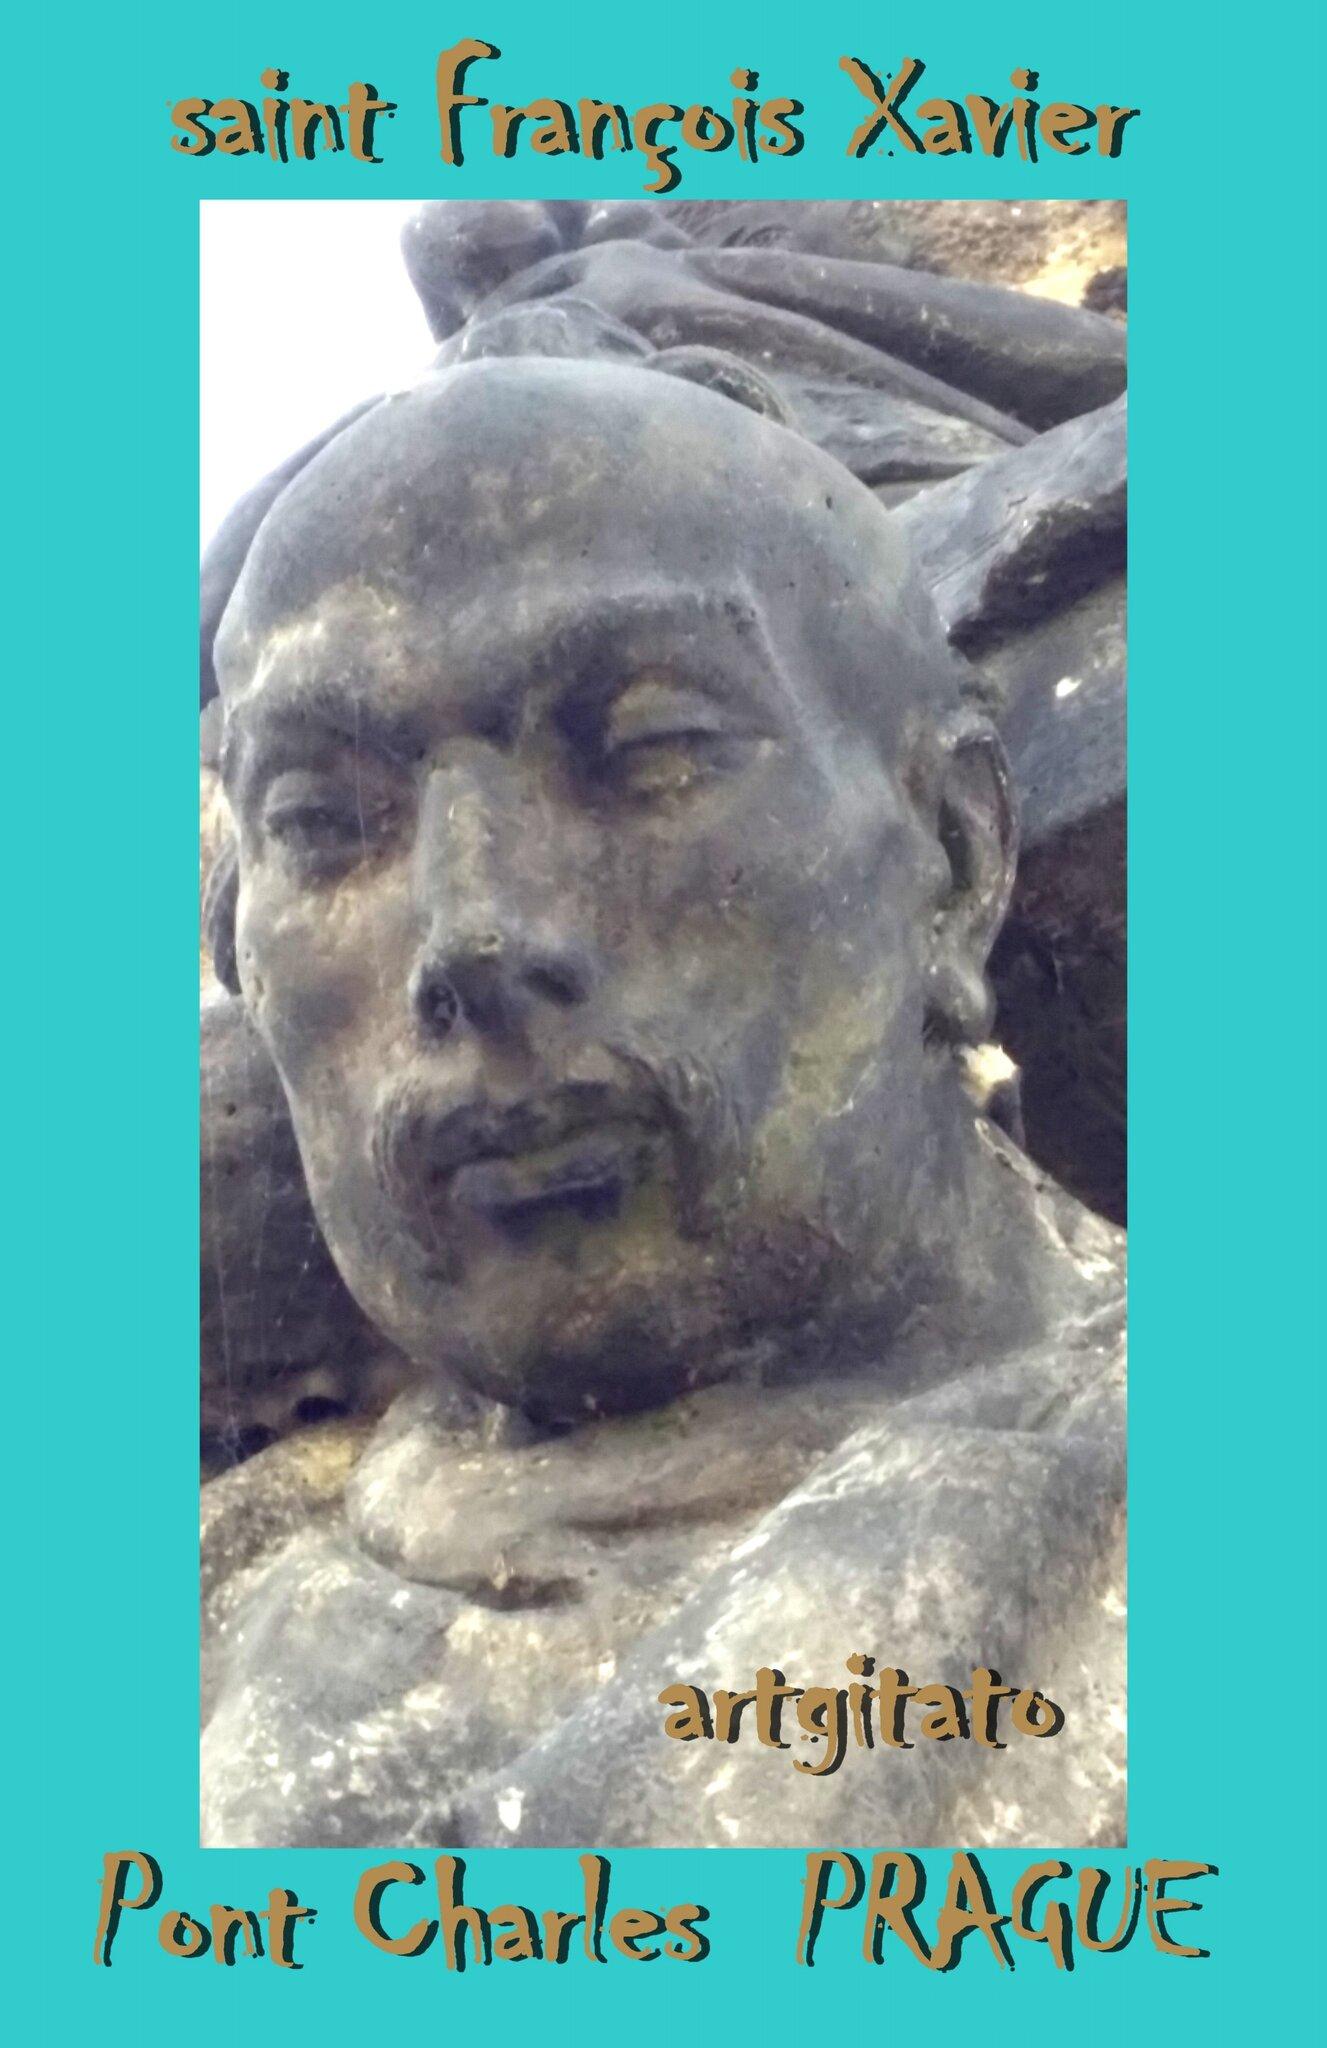 saint François Xavier Pont Charles Prague Artgitato 3